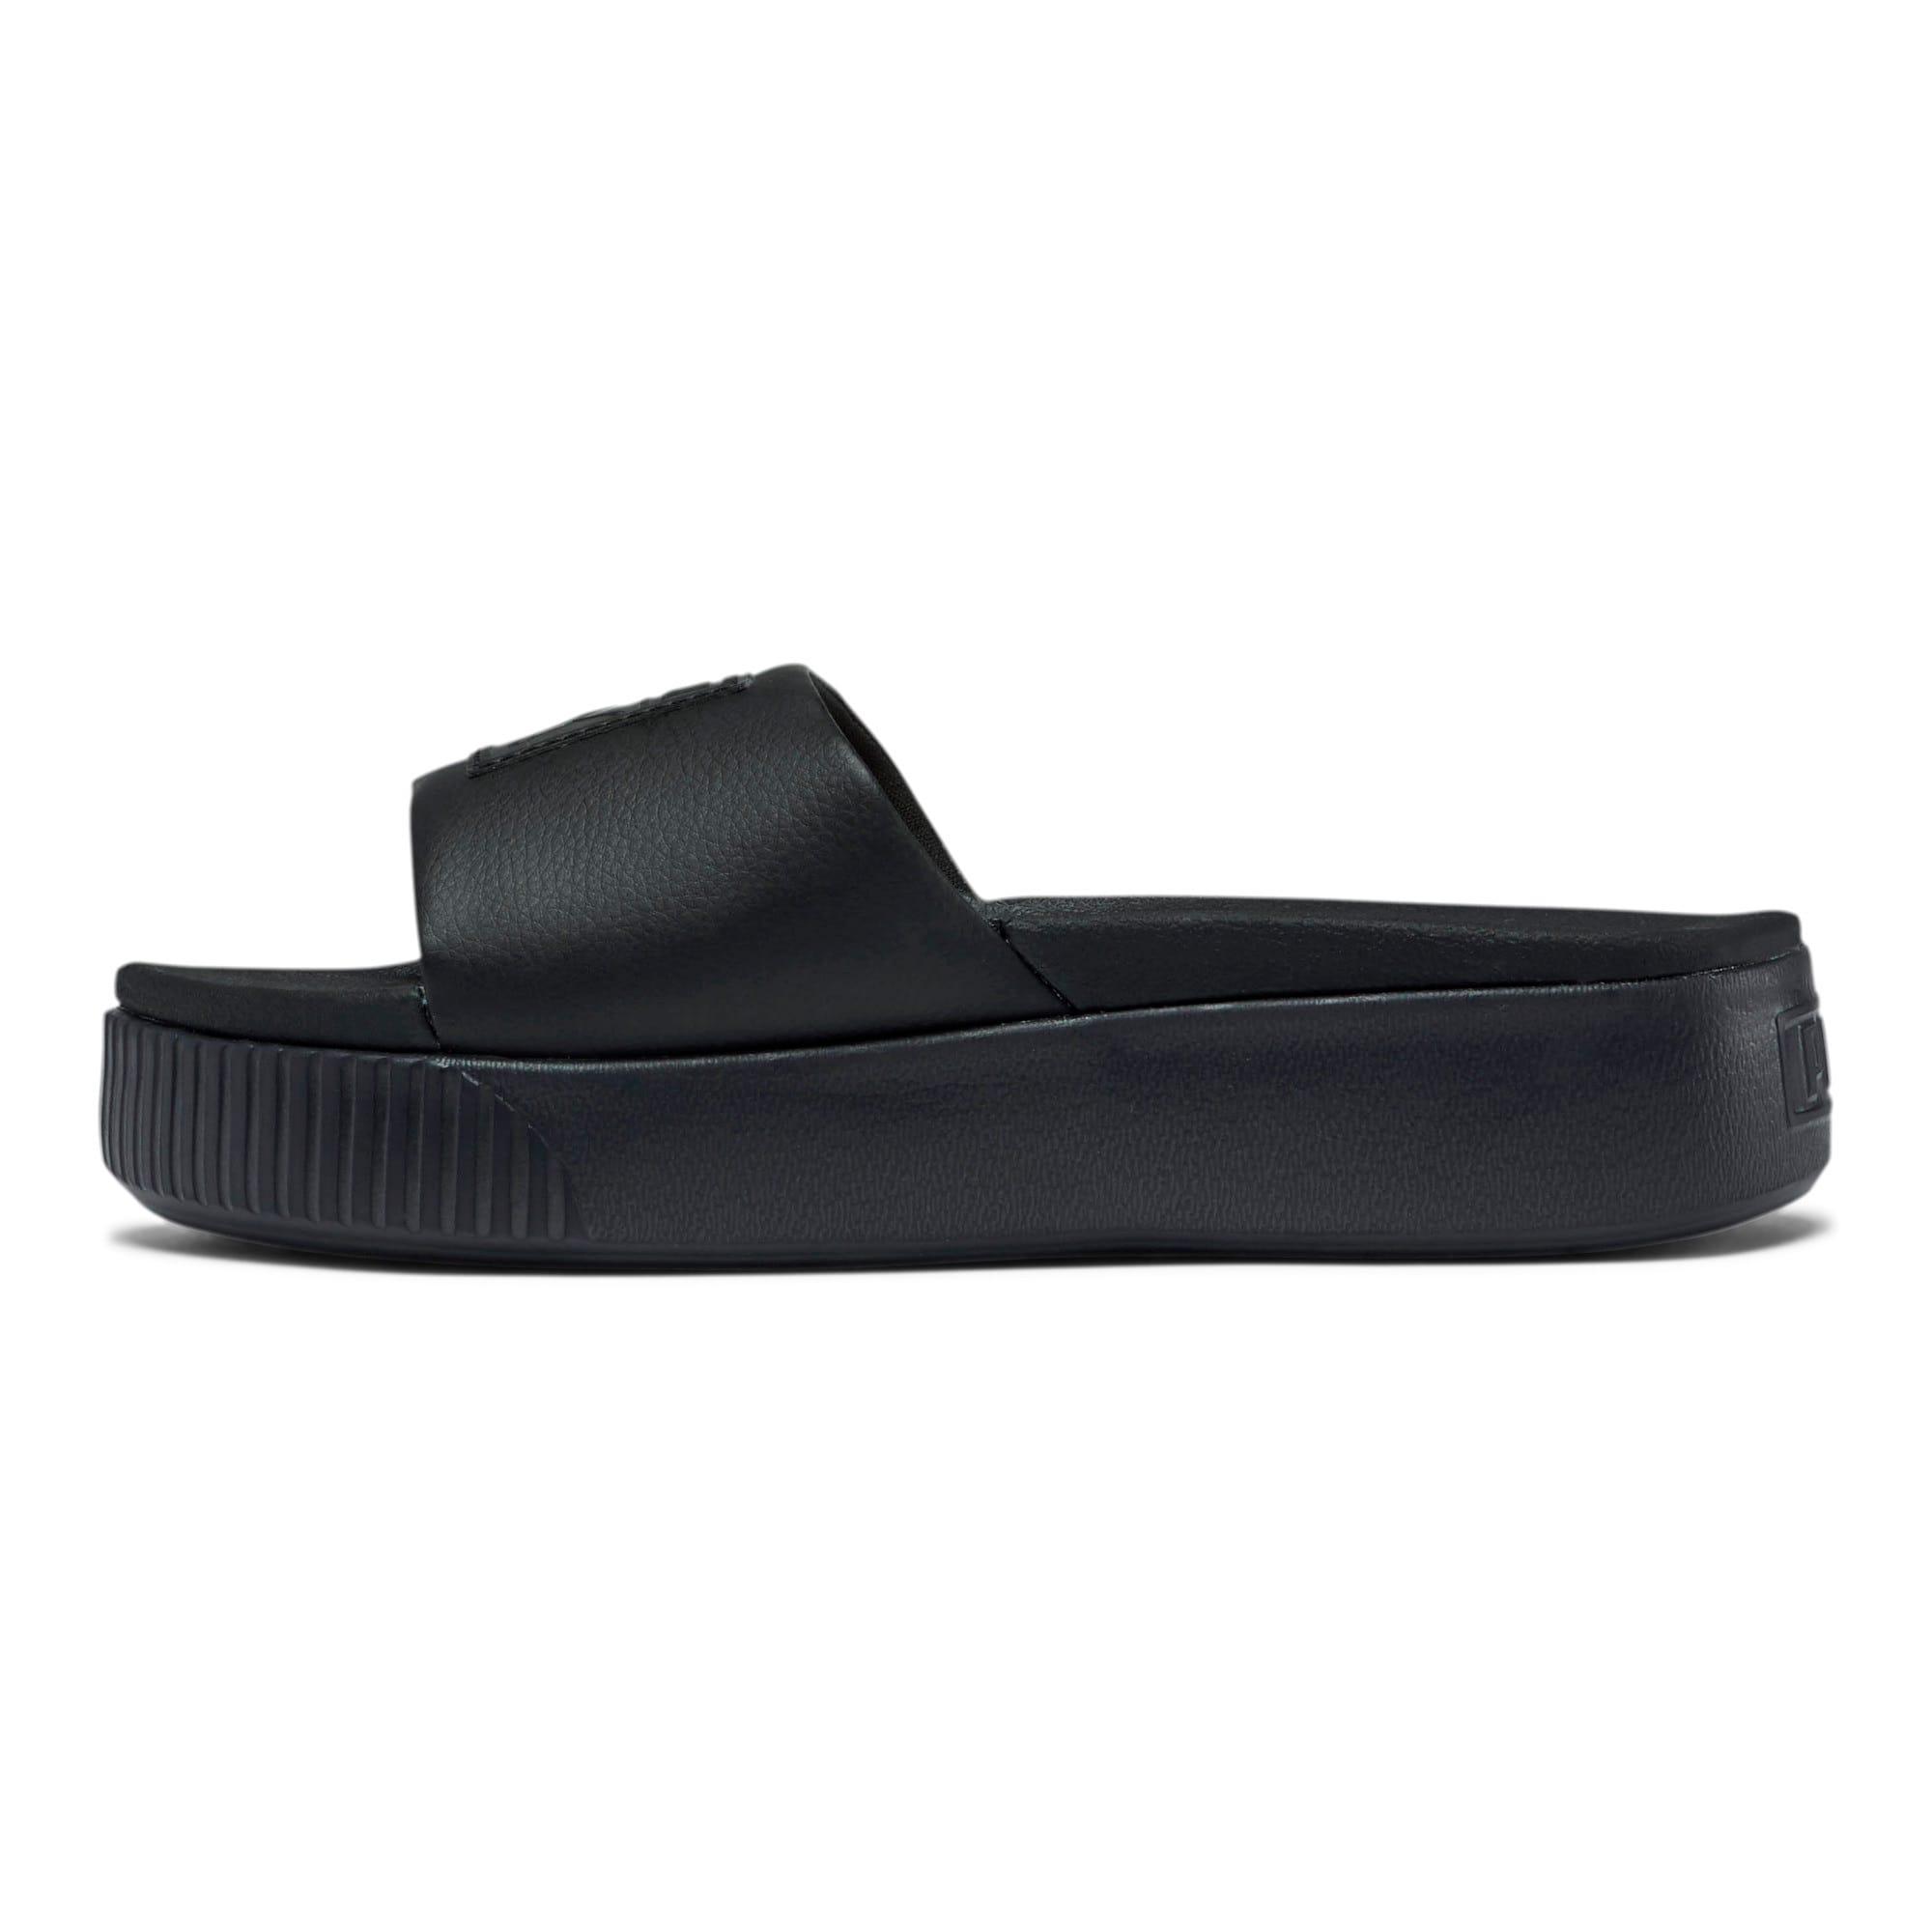 Thumbnail 1 of Platform Slide Women's Sandals, Puma Black-Puma Black, medium